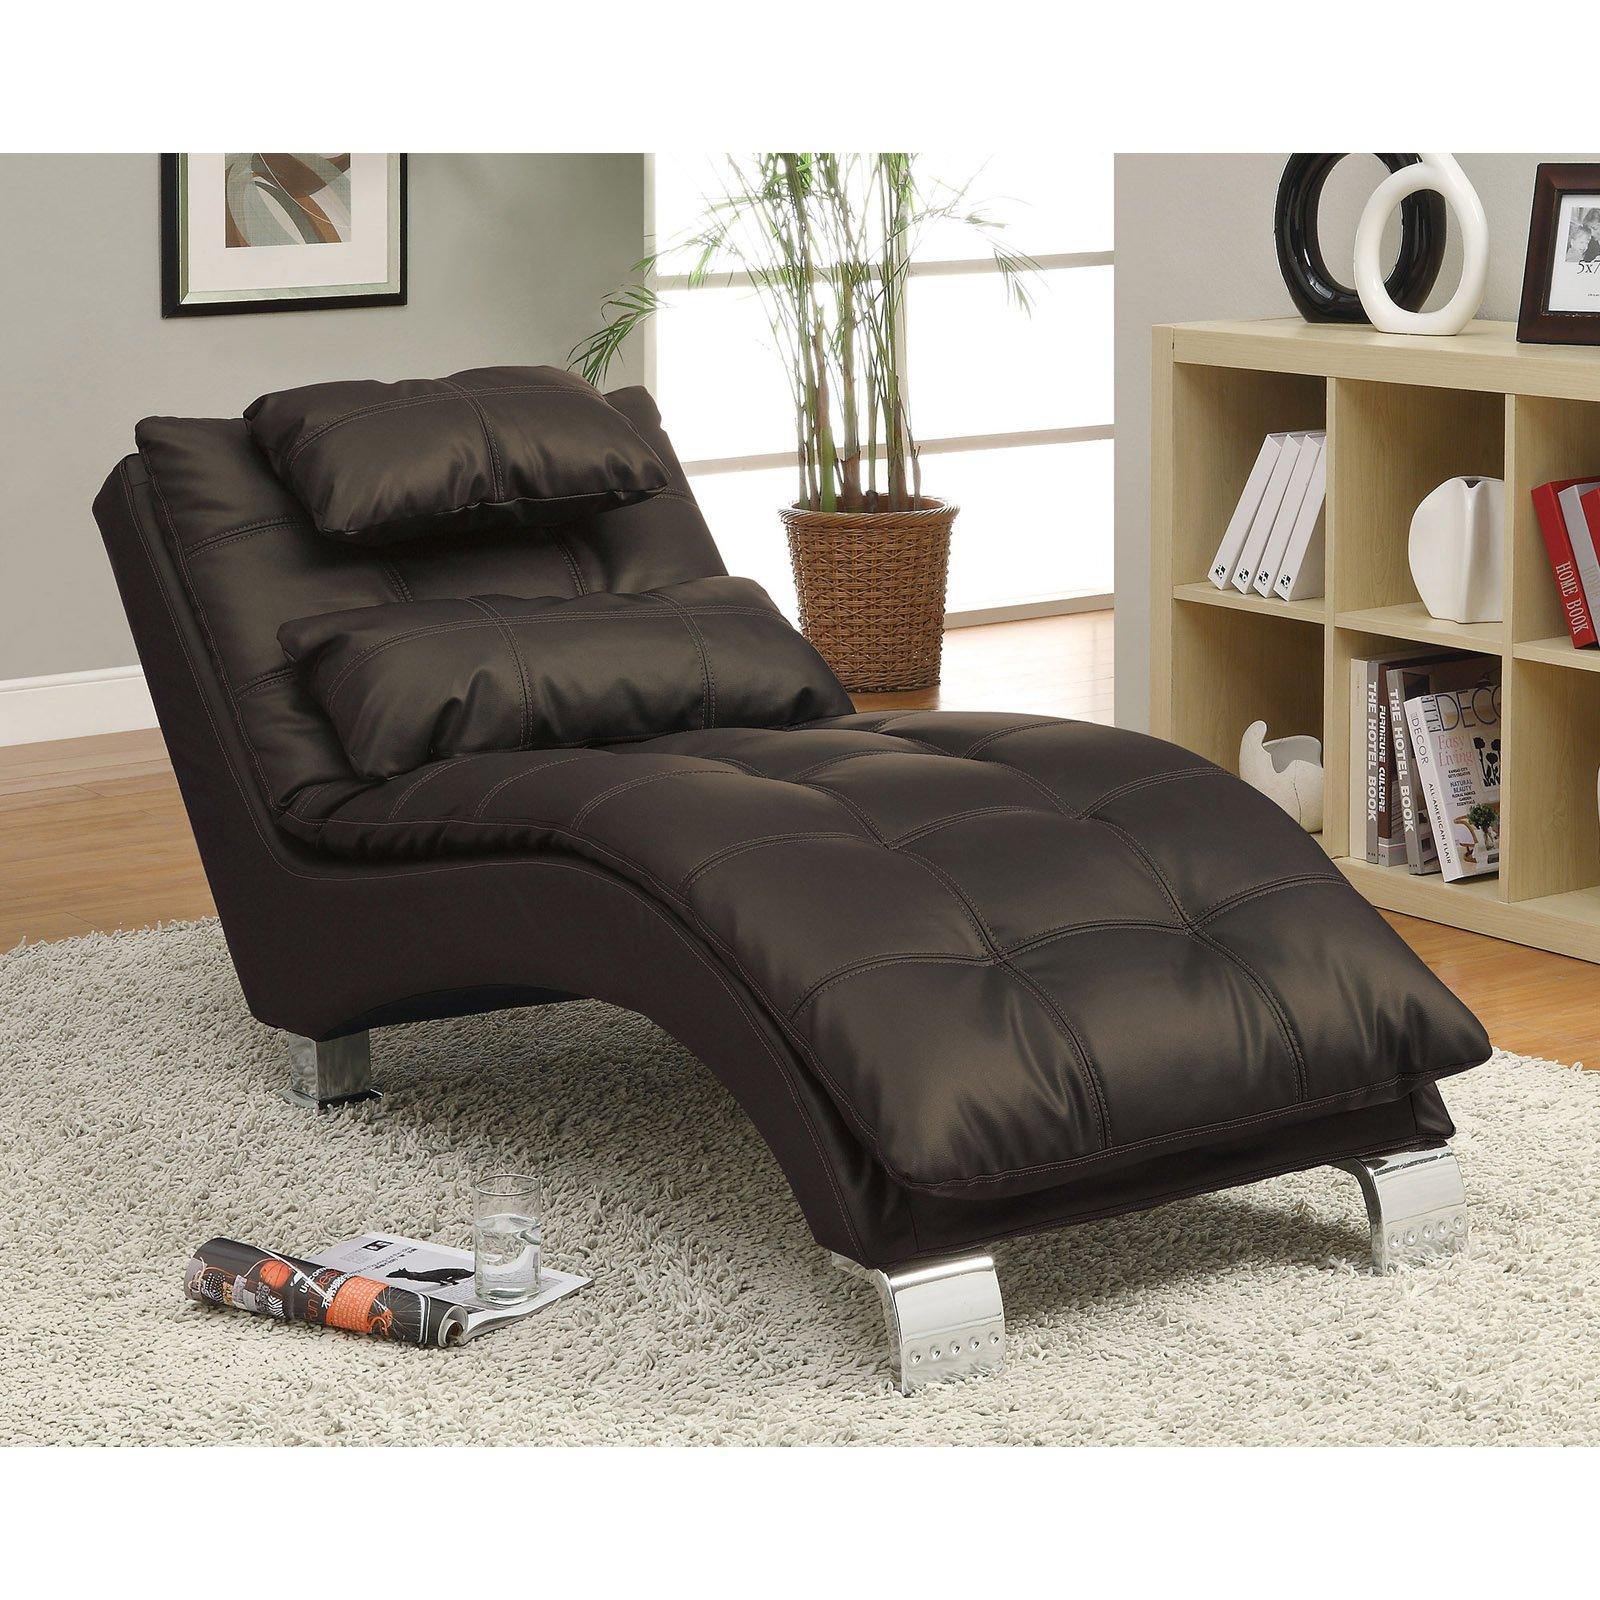 Coaster Company Chaise, Dark Brown/Chrome